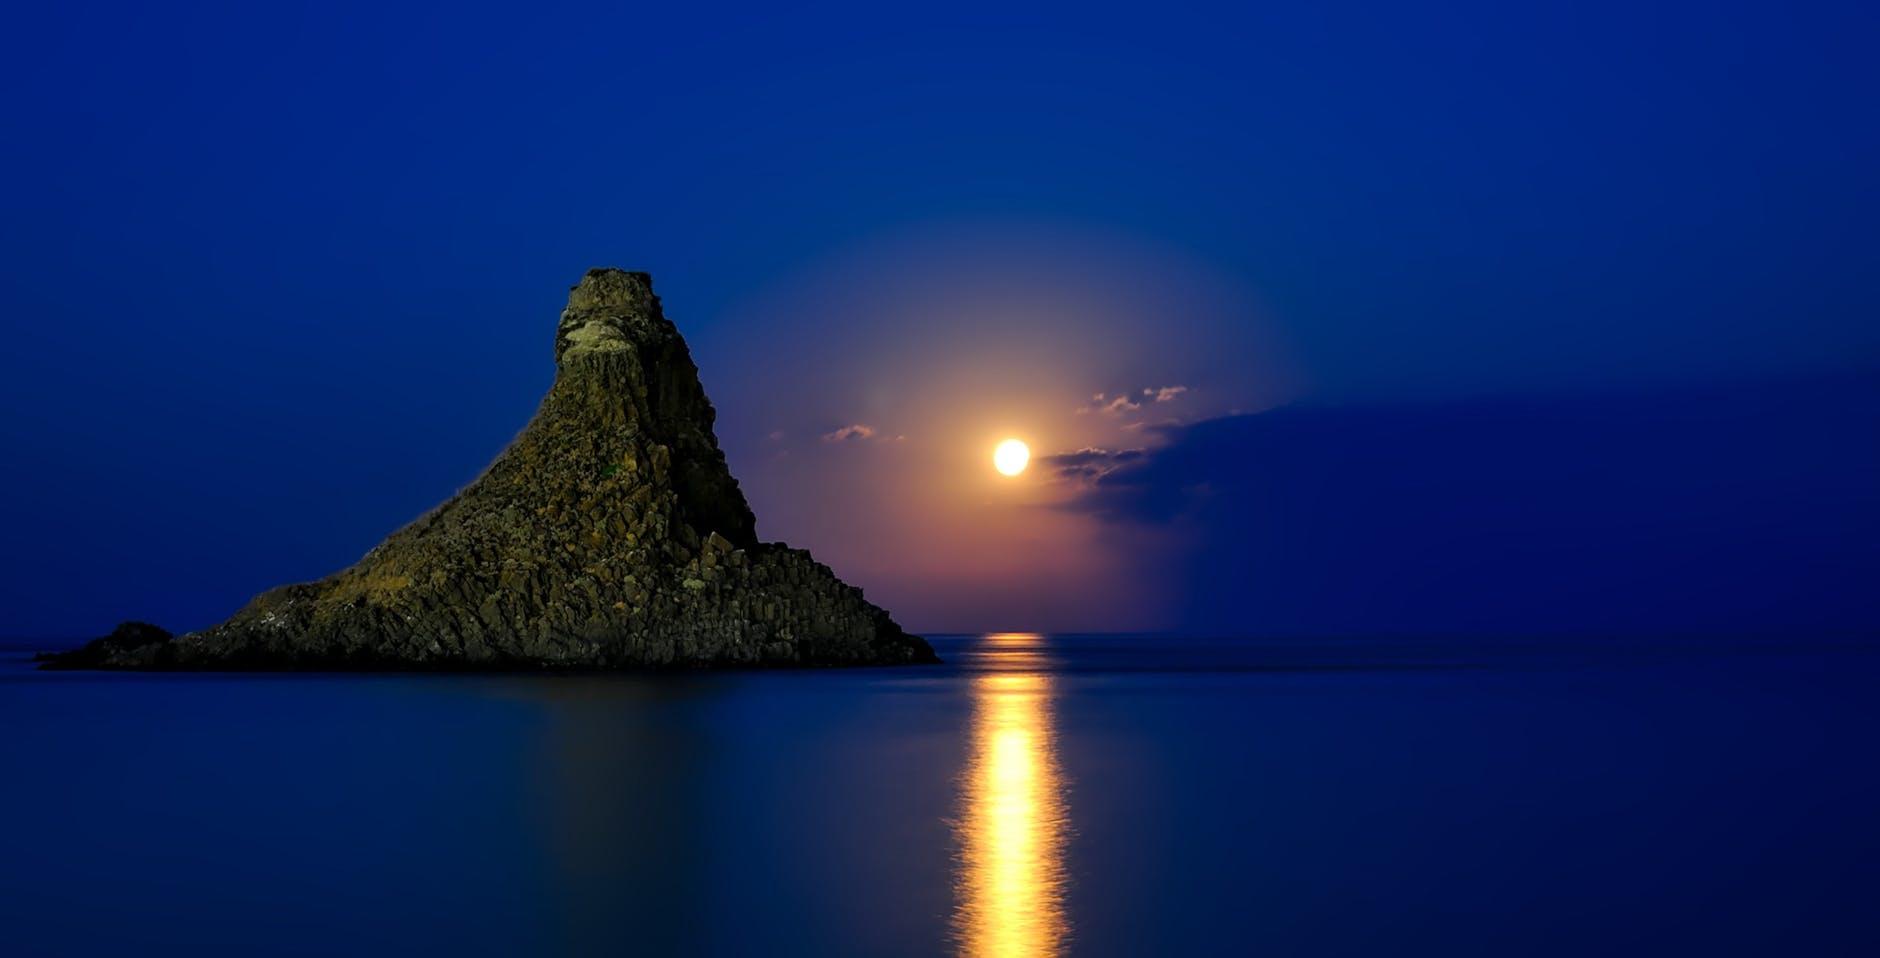 italy-sicily-sea-ocean-163891.jpeg